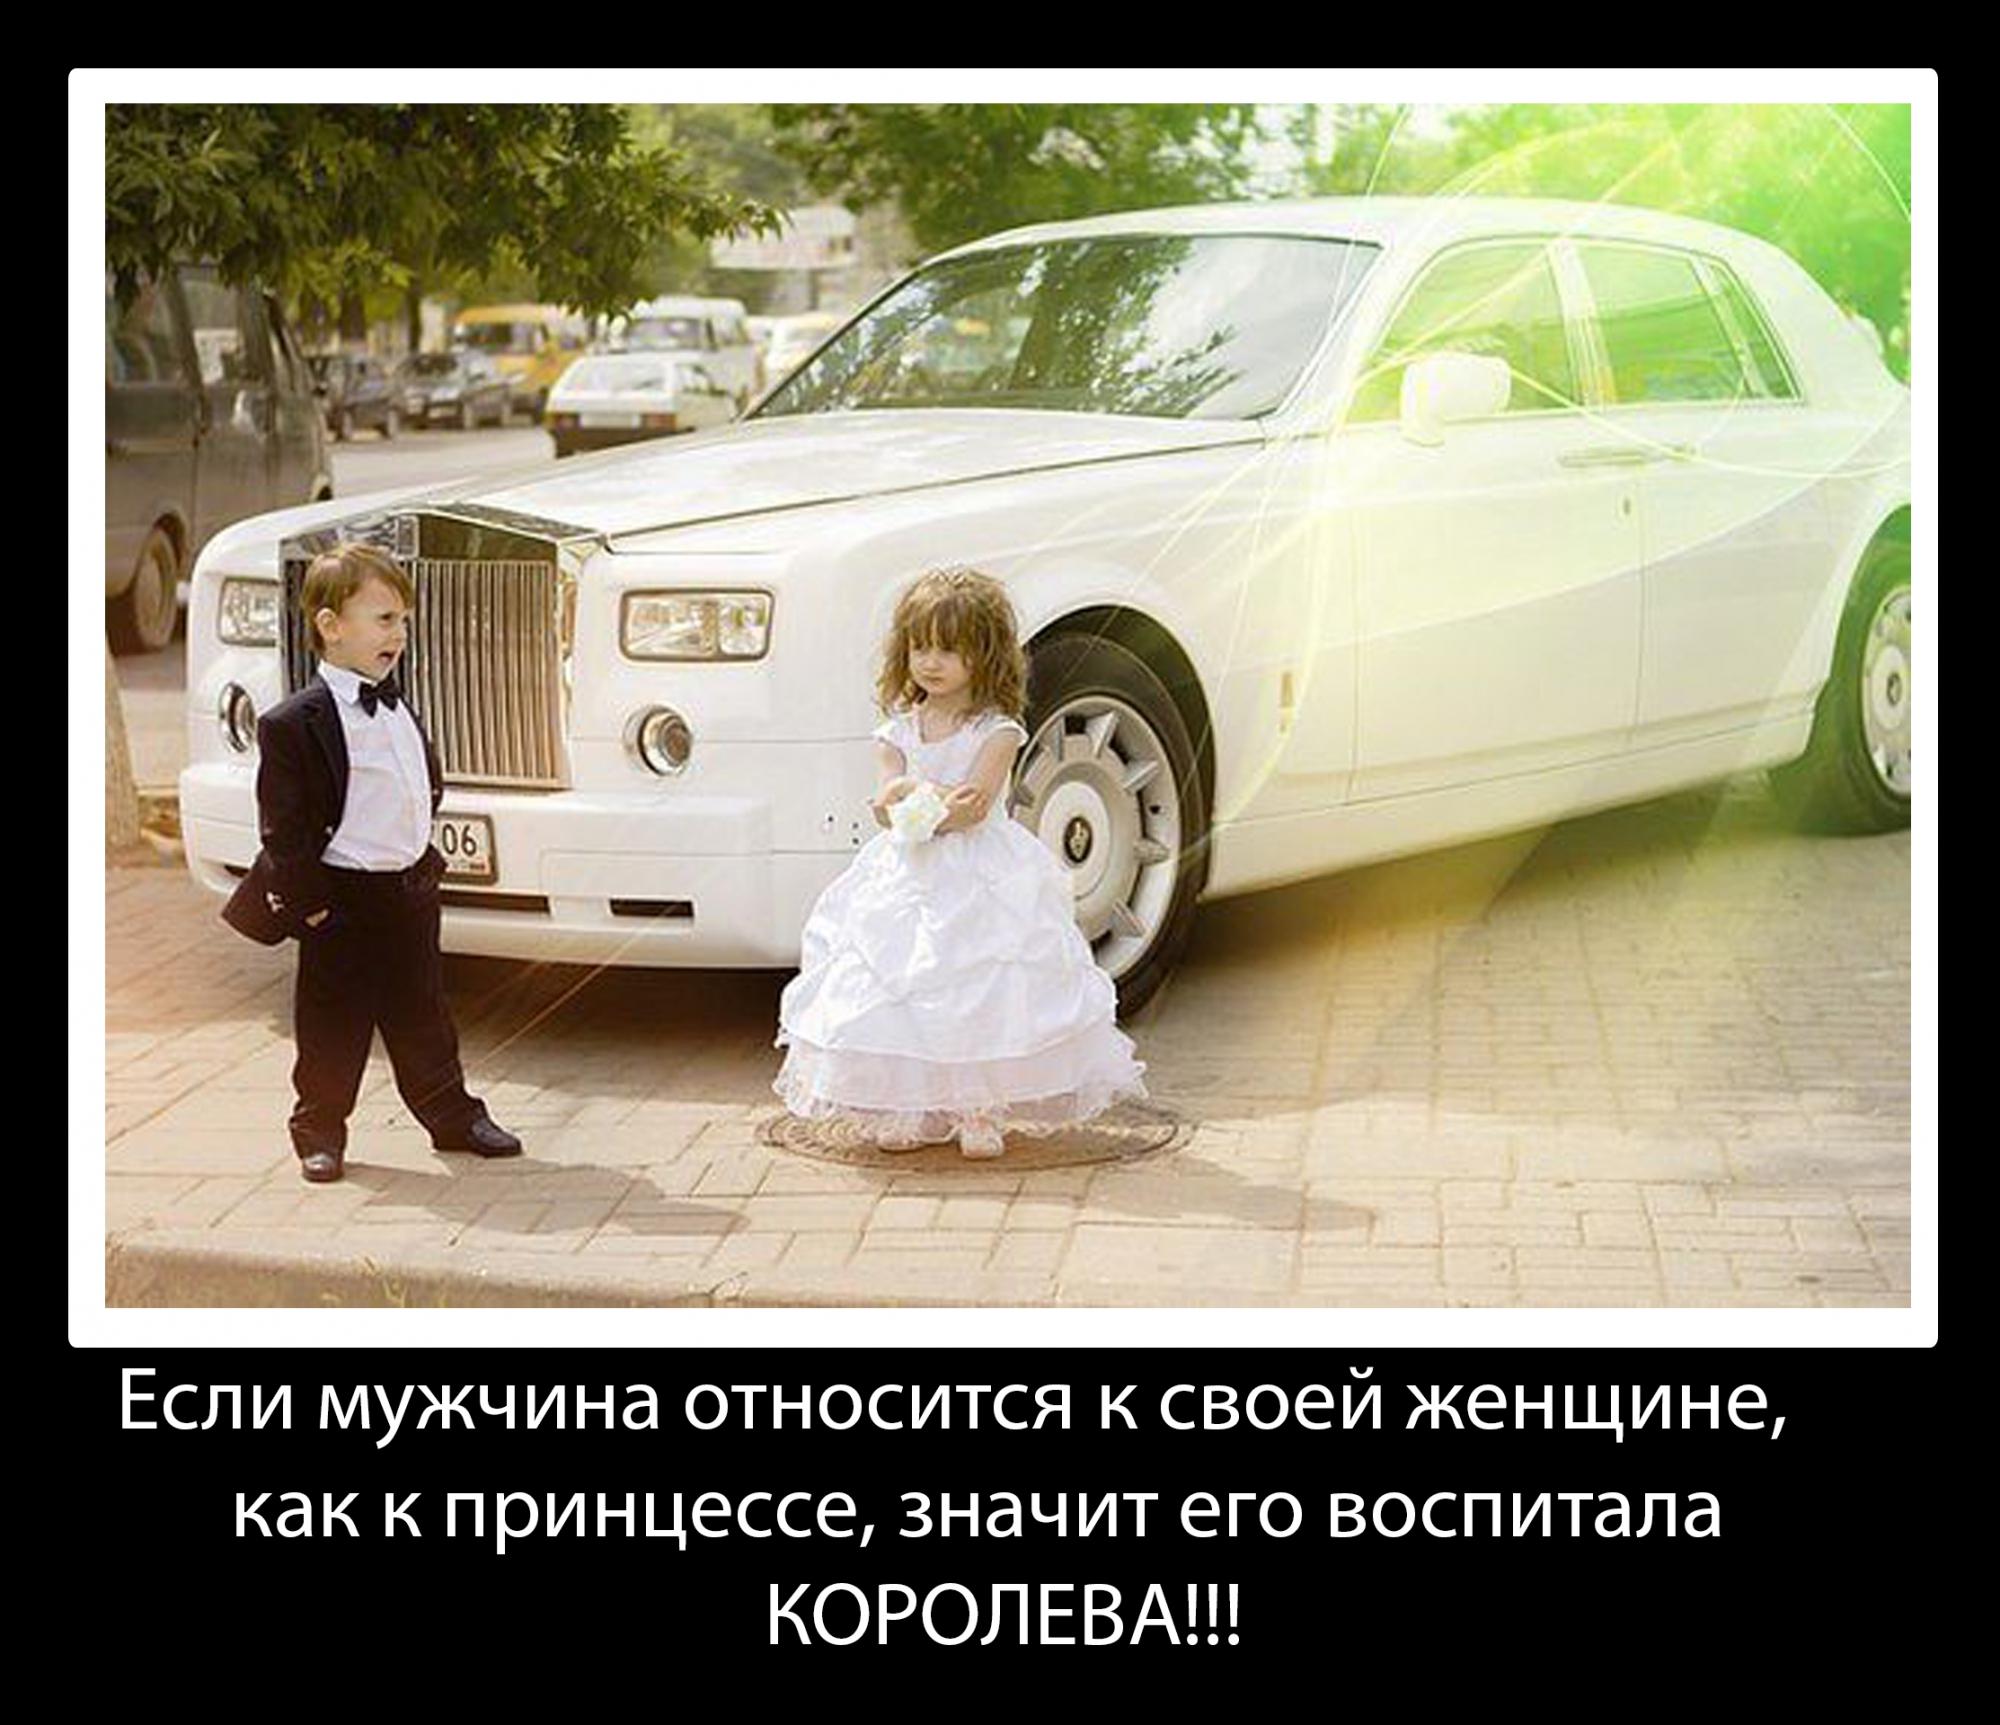 юмор про свадьбу картинки цены установку дверей